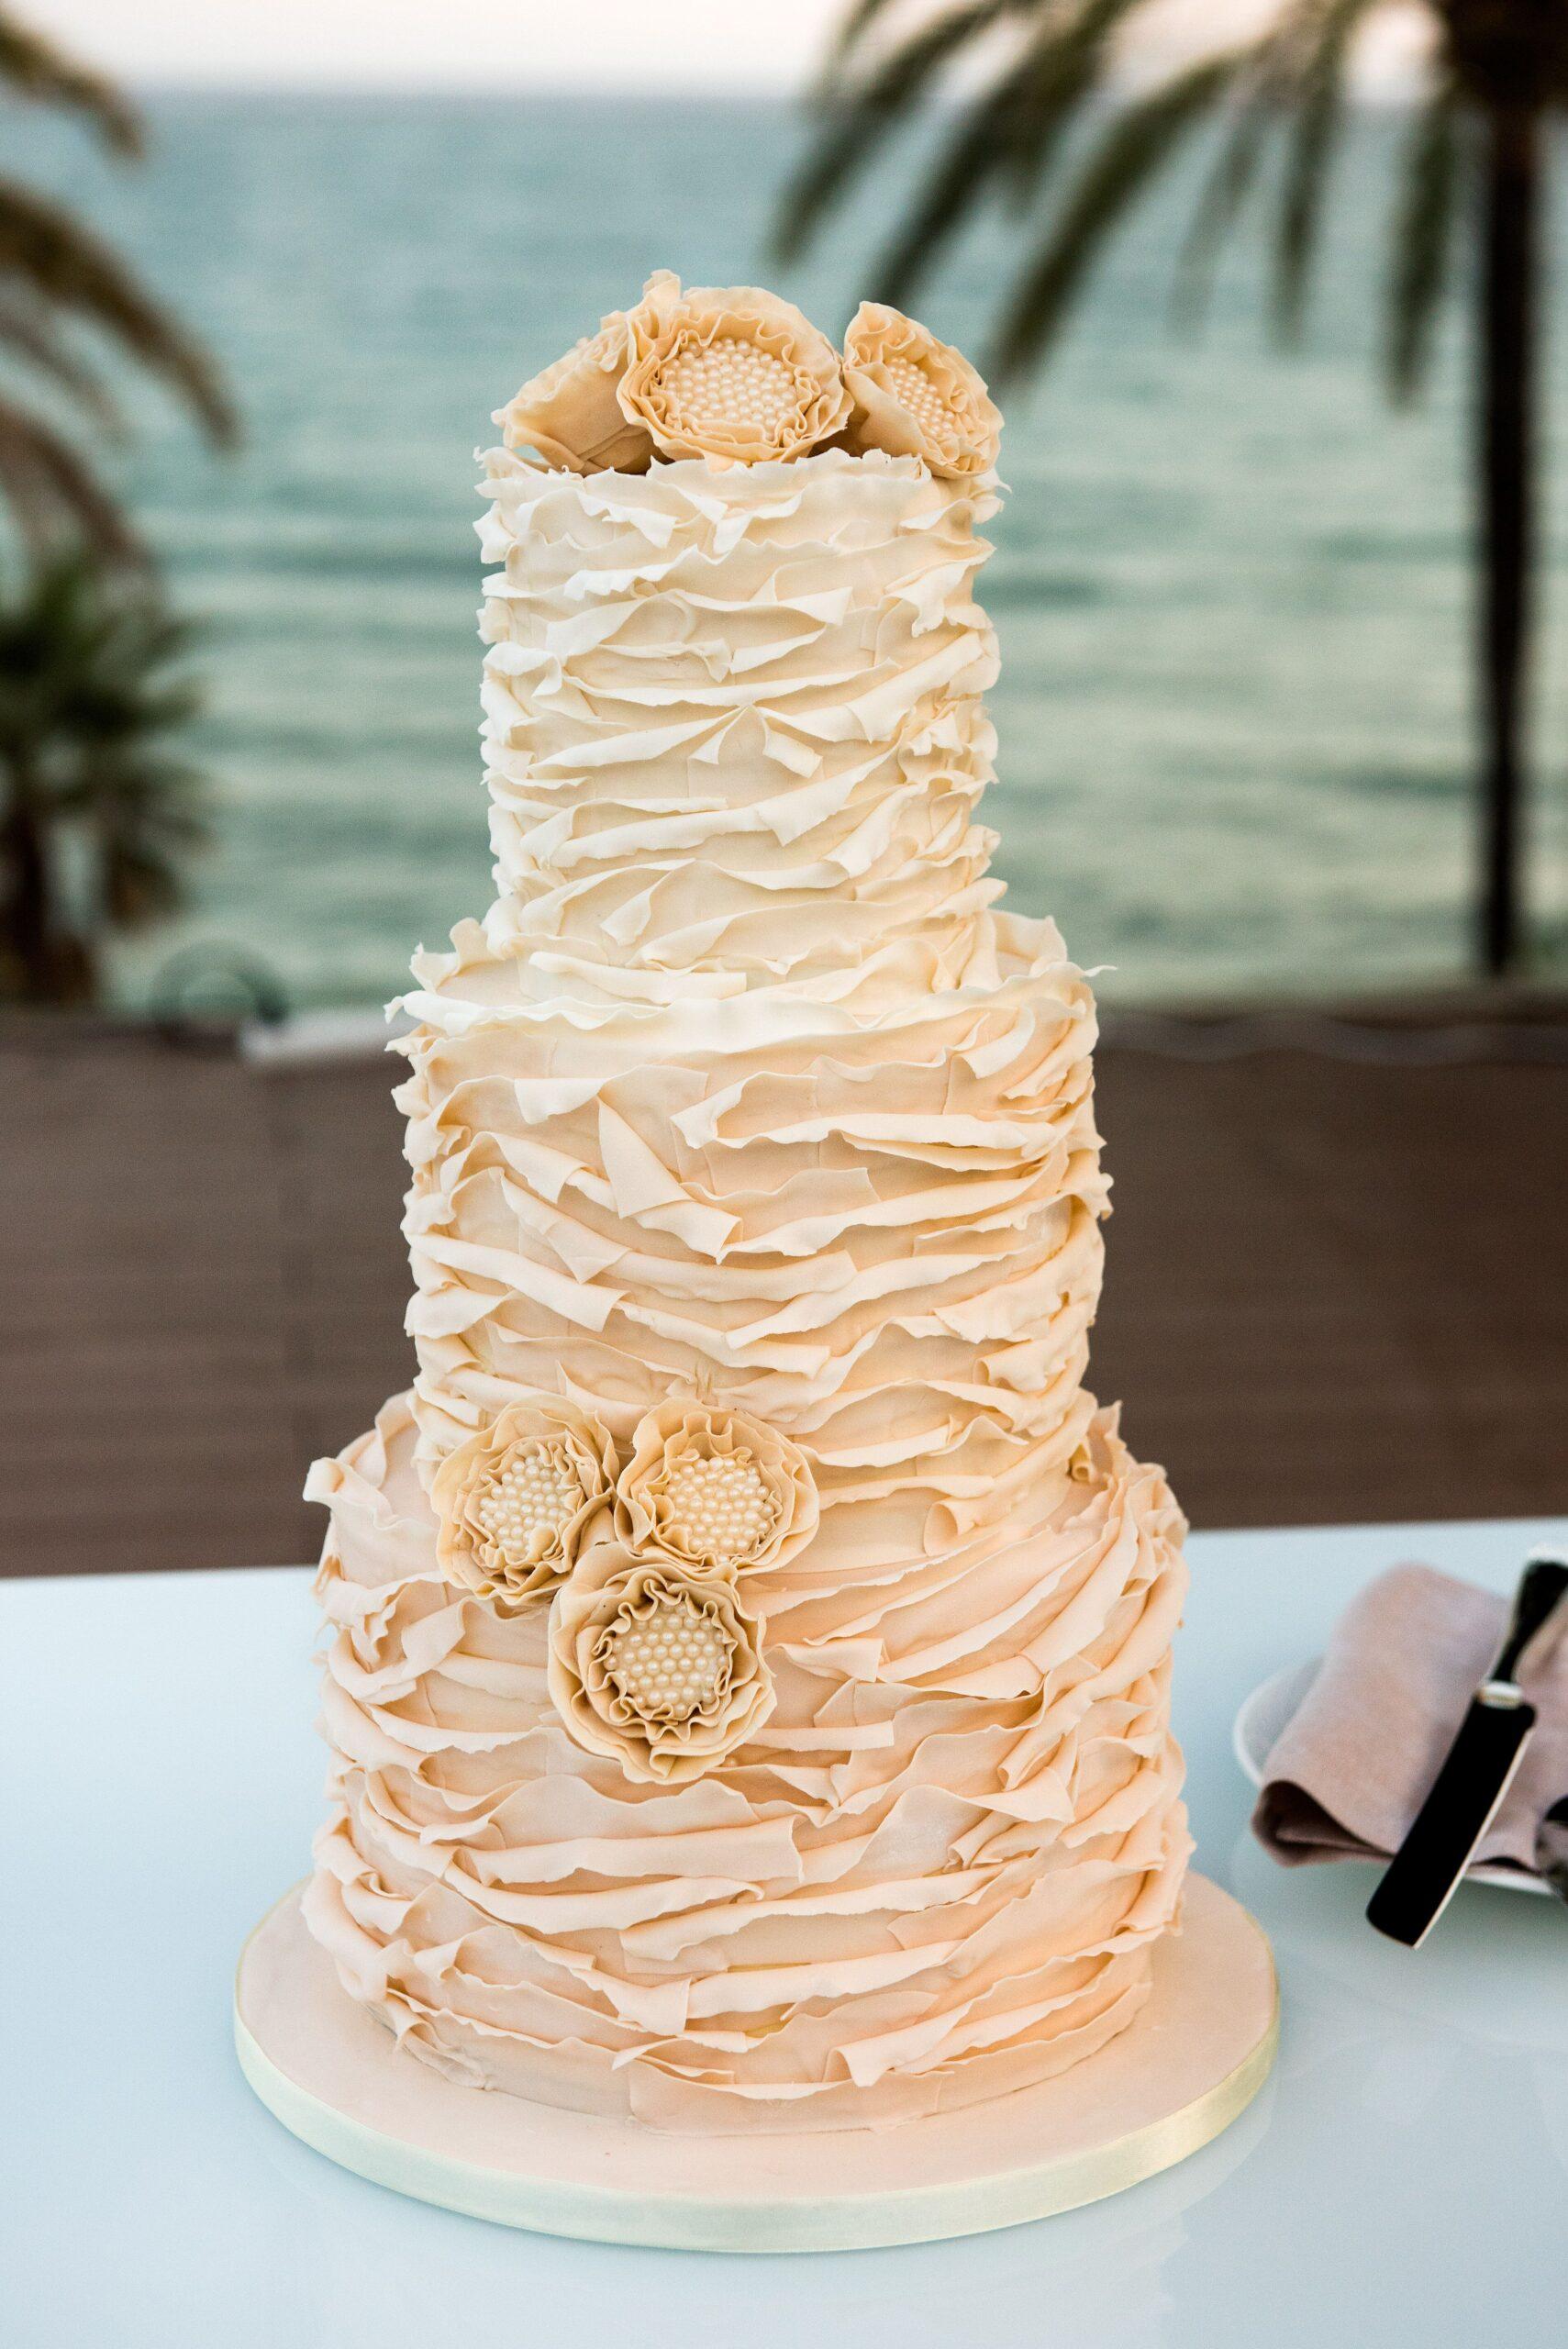 The beautiful wedding cake